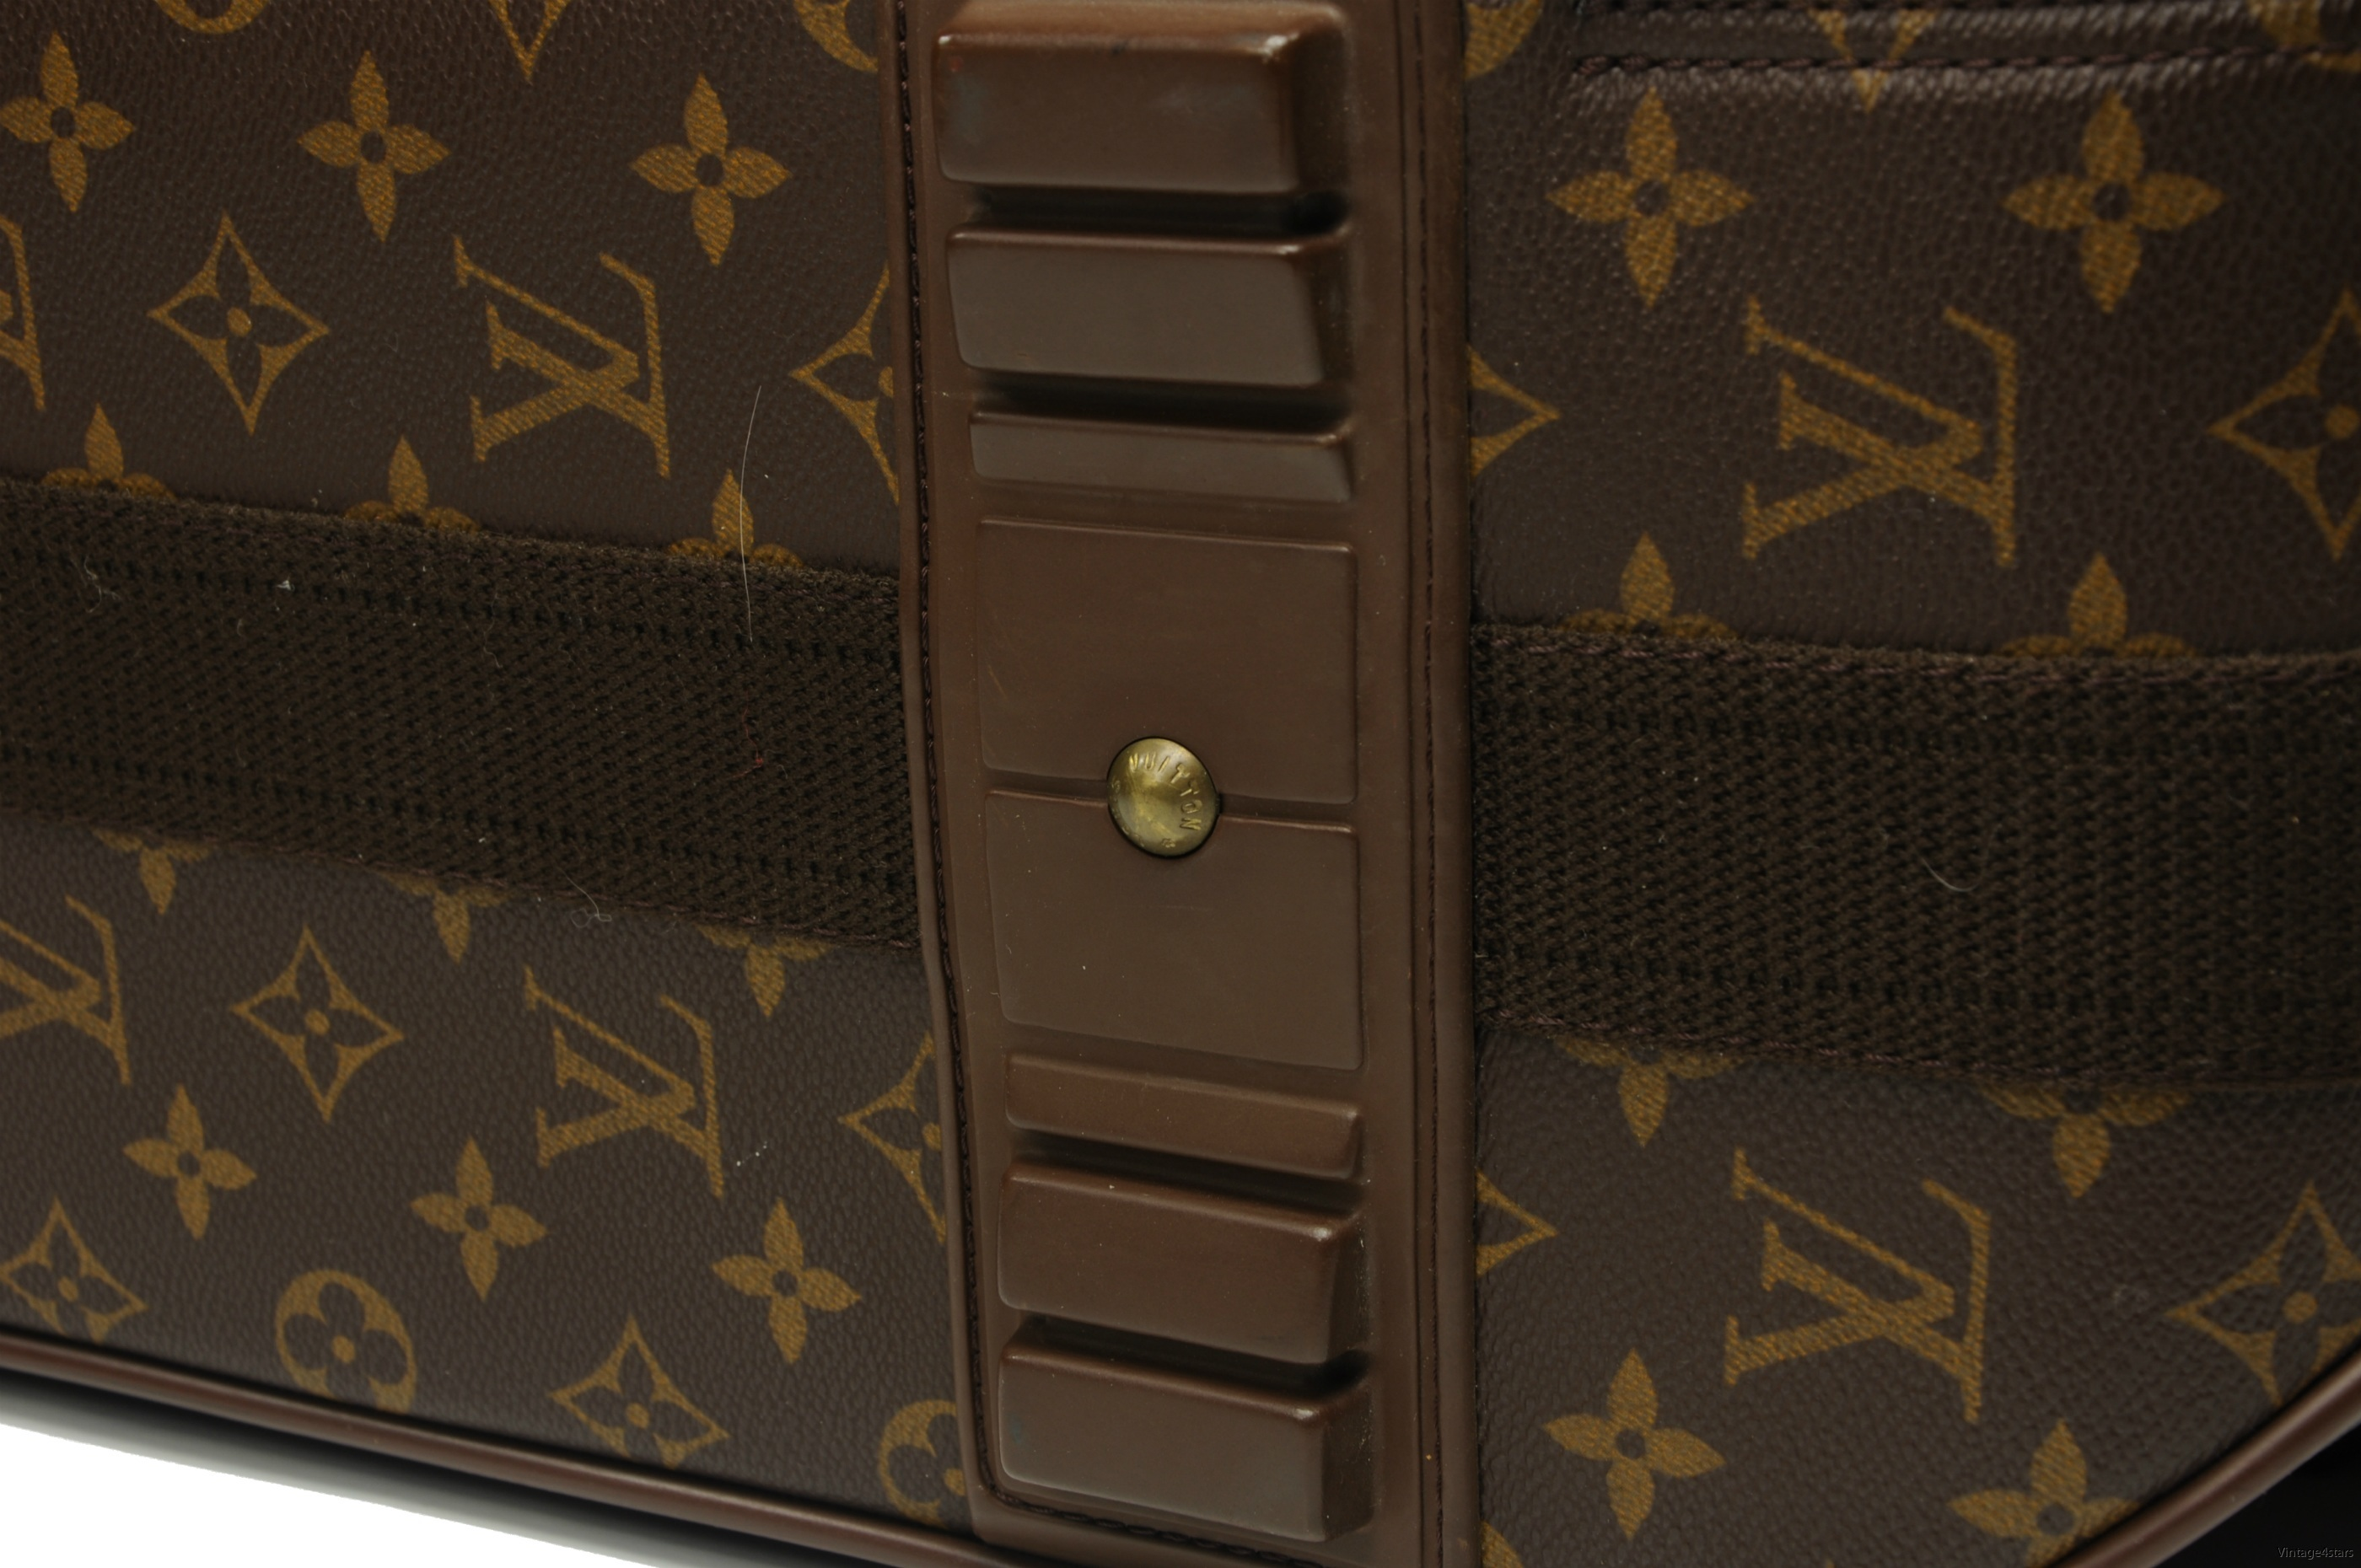 Louis Vuitton Pegase 55 Monogram 6